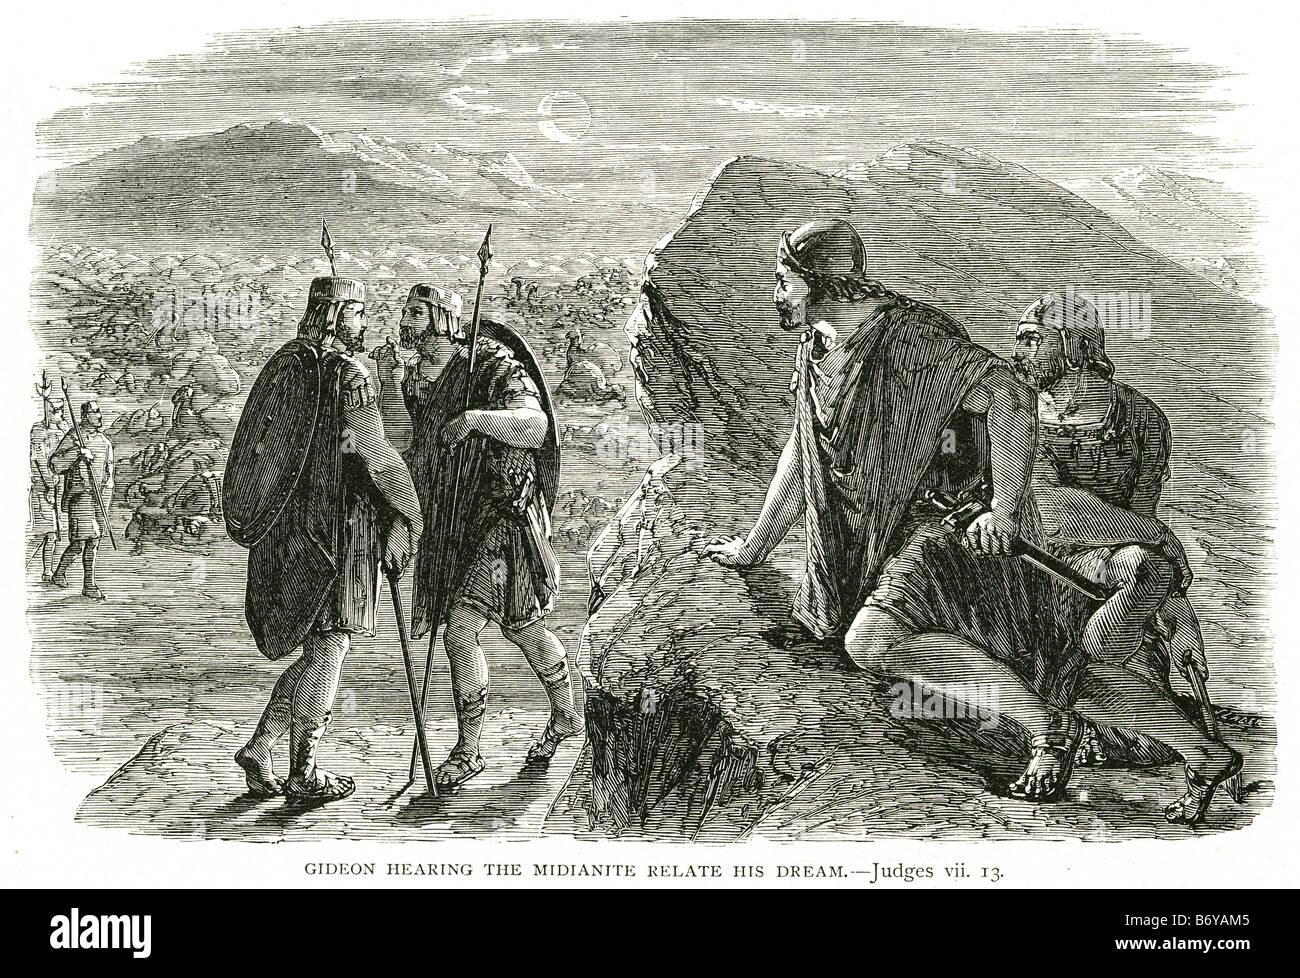 gideon hearing the midianite relate his dream Jerub-Baal Book of Judges Bible Epistle Hebrew faith - Stock Image